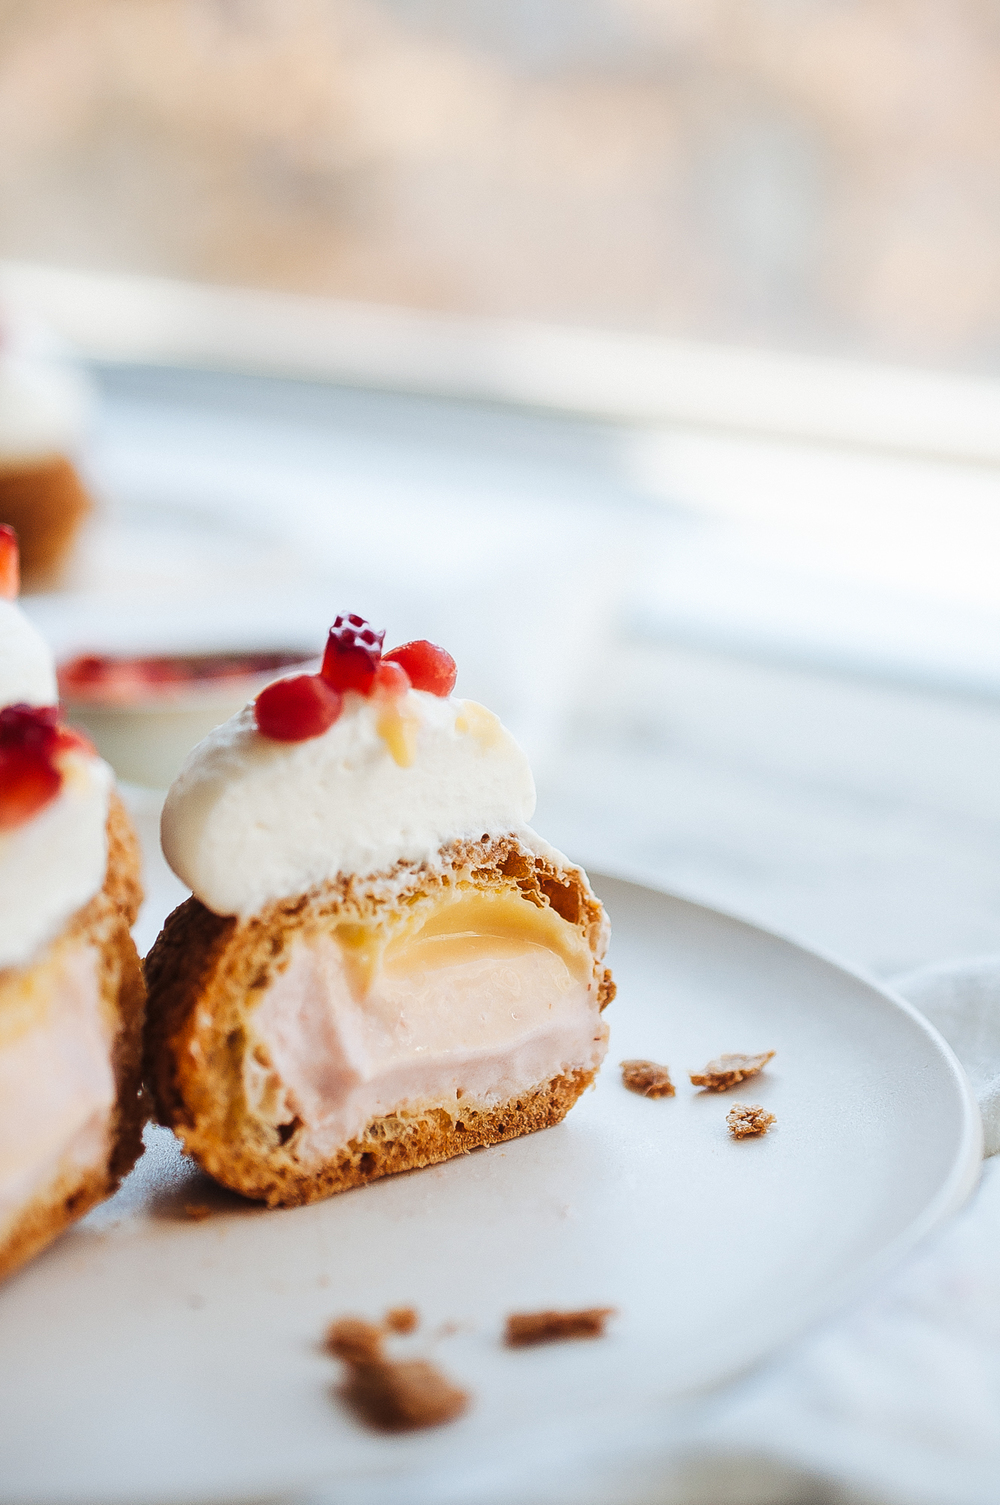 Strawberry passion fruit cream puffs 13.jpg